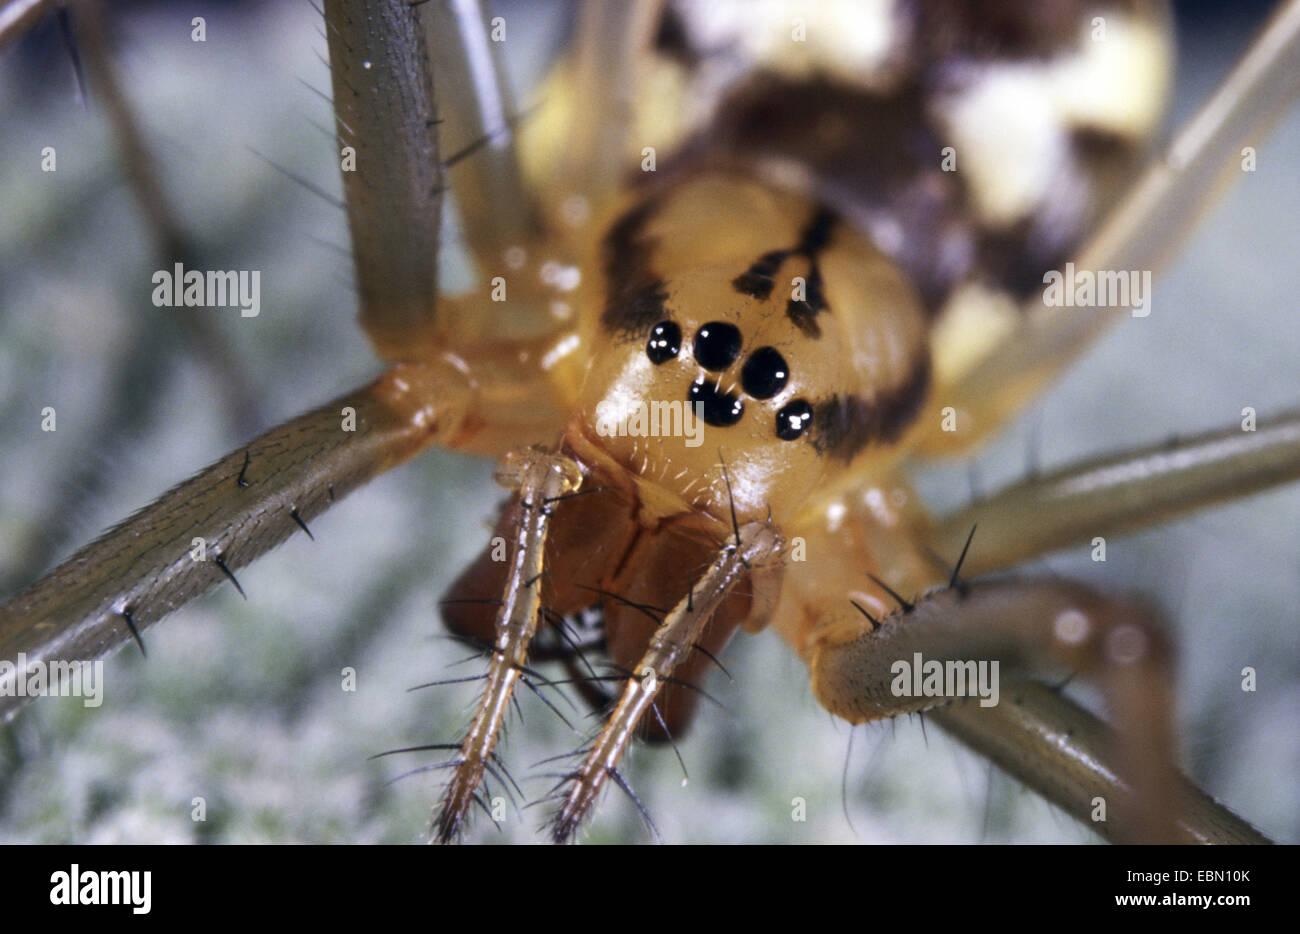 Hoja-web Weaver, Línea de tejer, araña tejedora de línea (Linyphia triangularis), hembra, Alemania Imagen De Stock